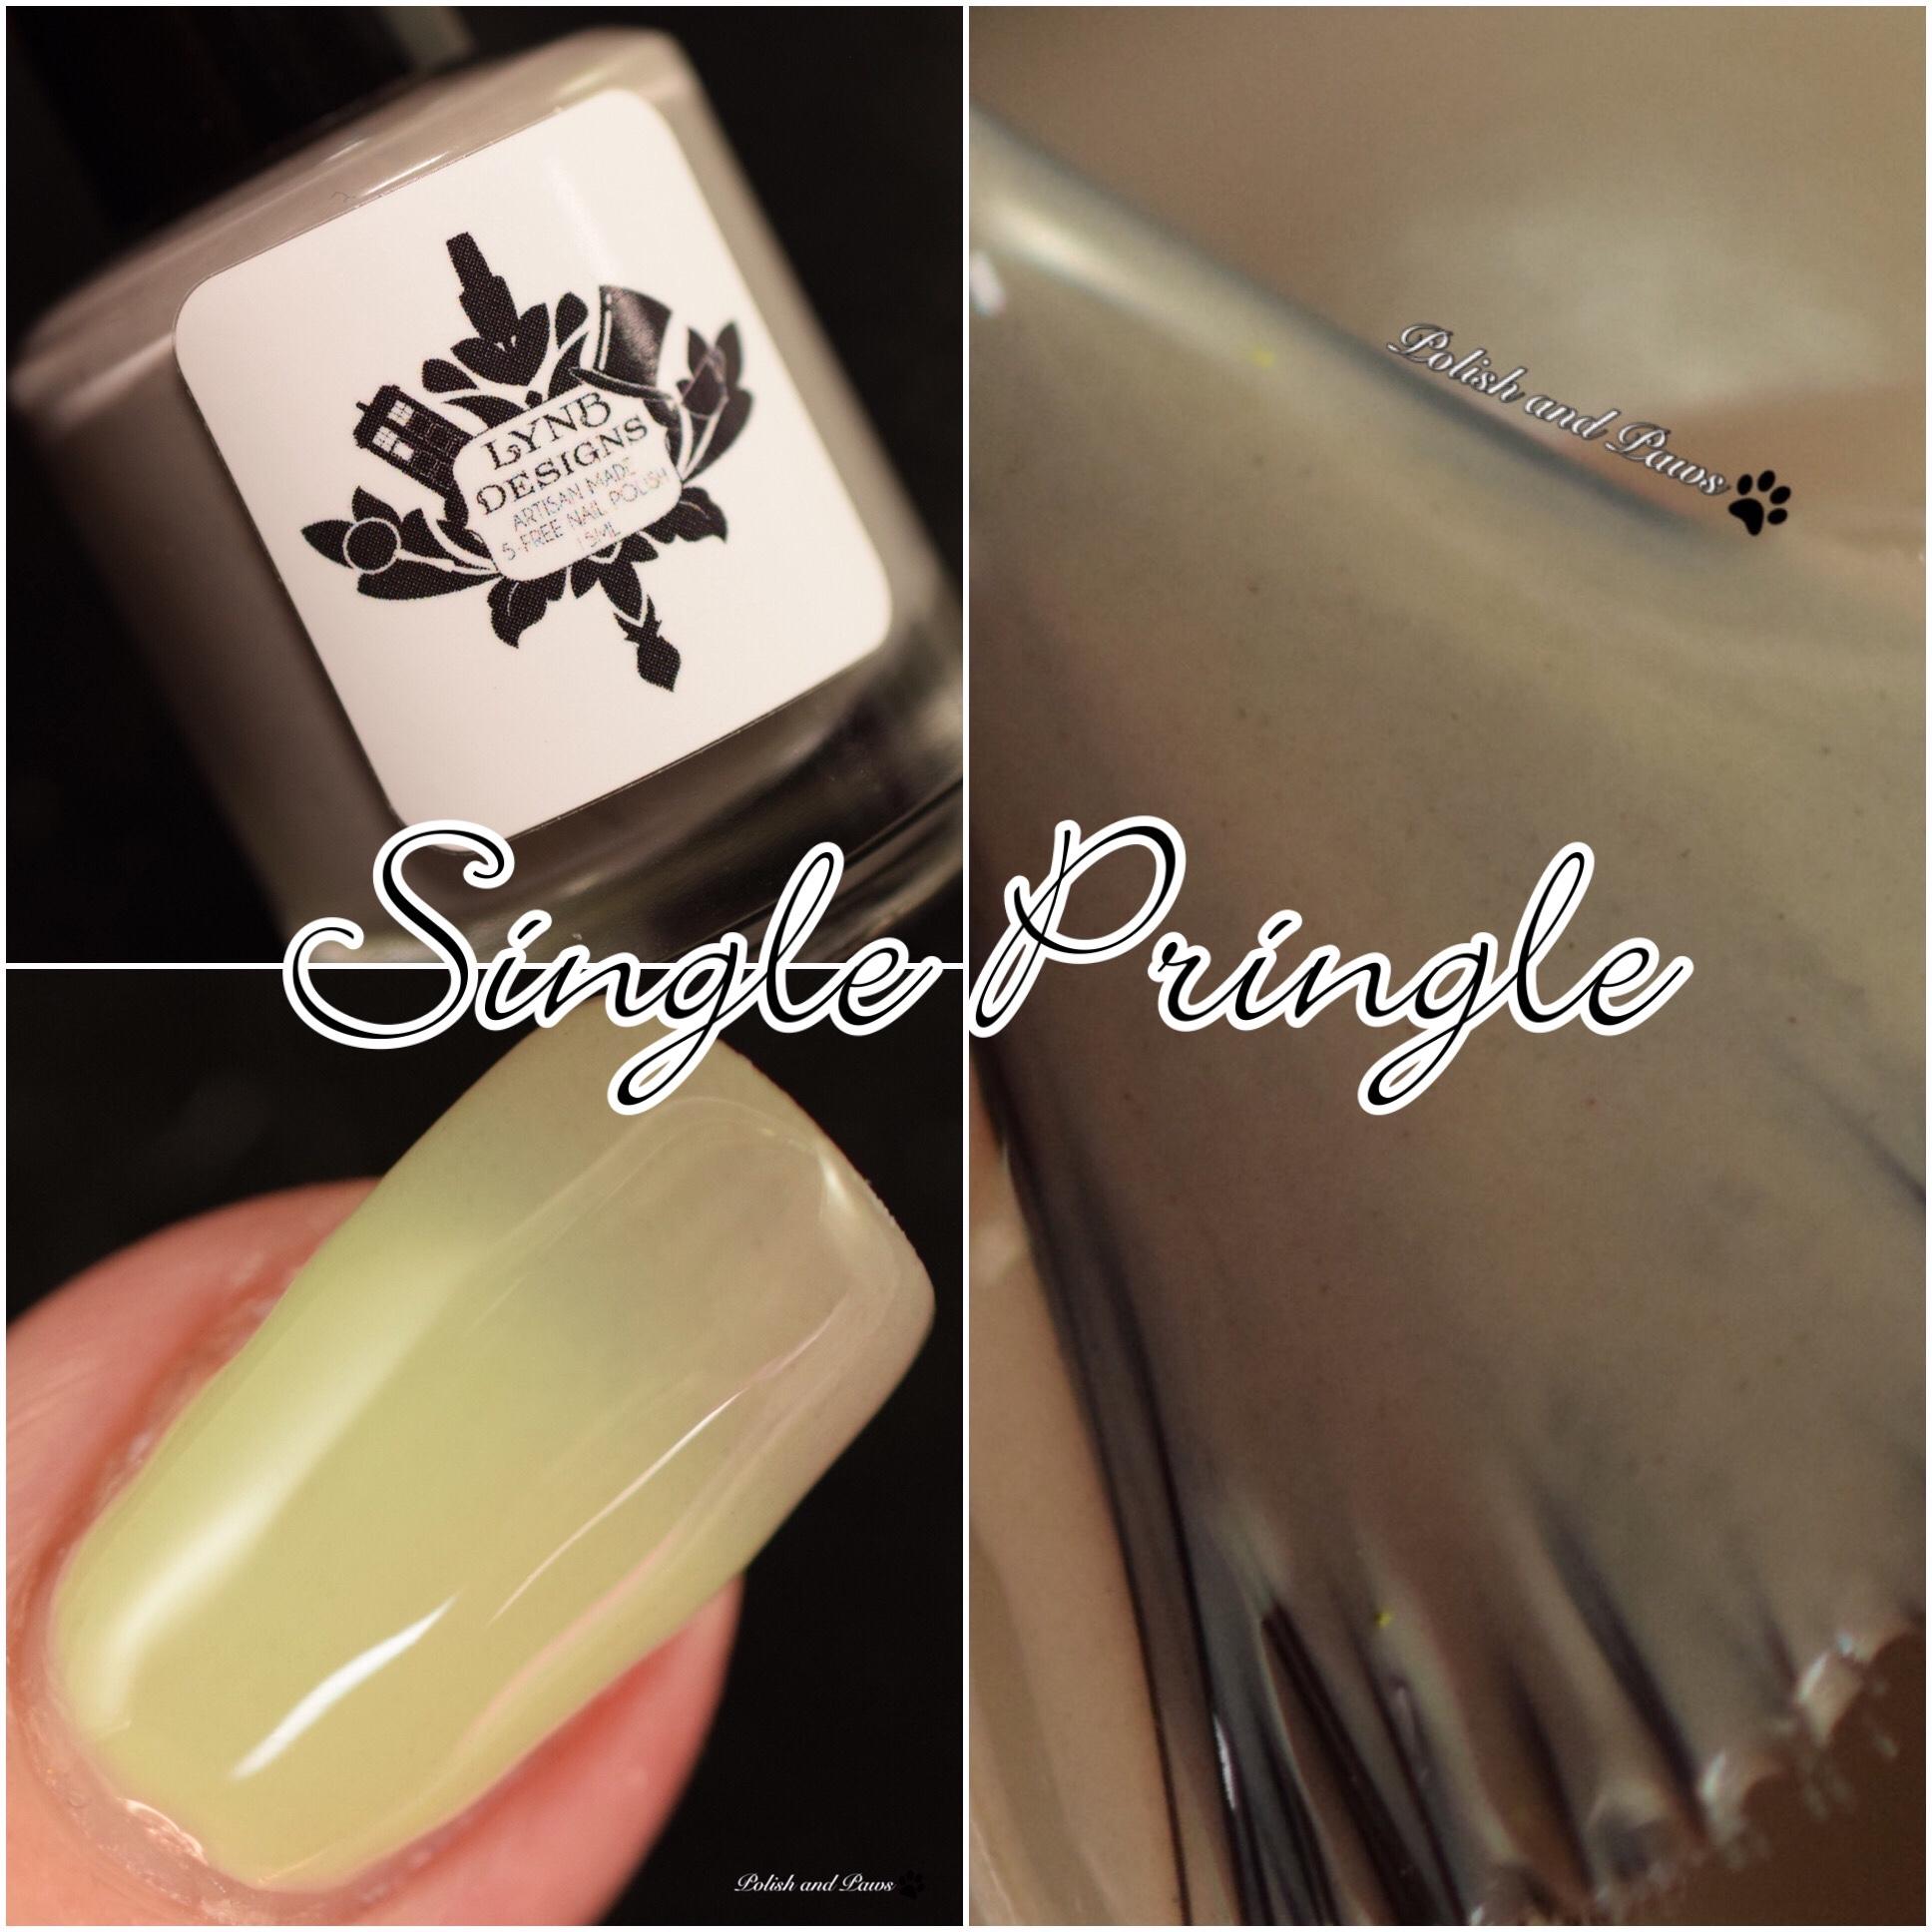 LynB Designs Single Pringle